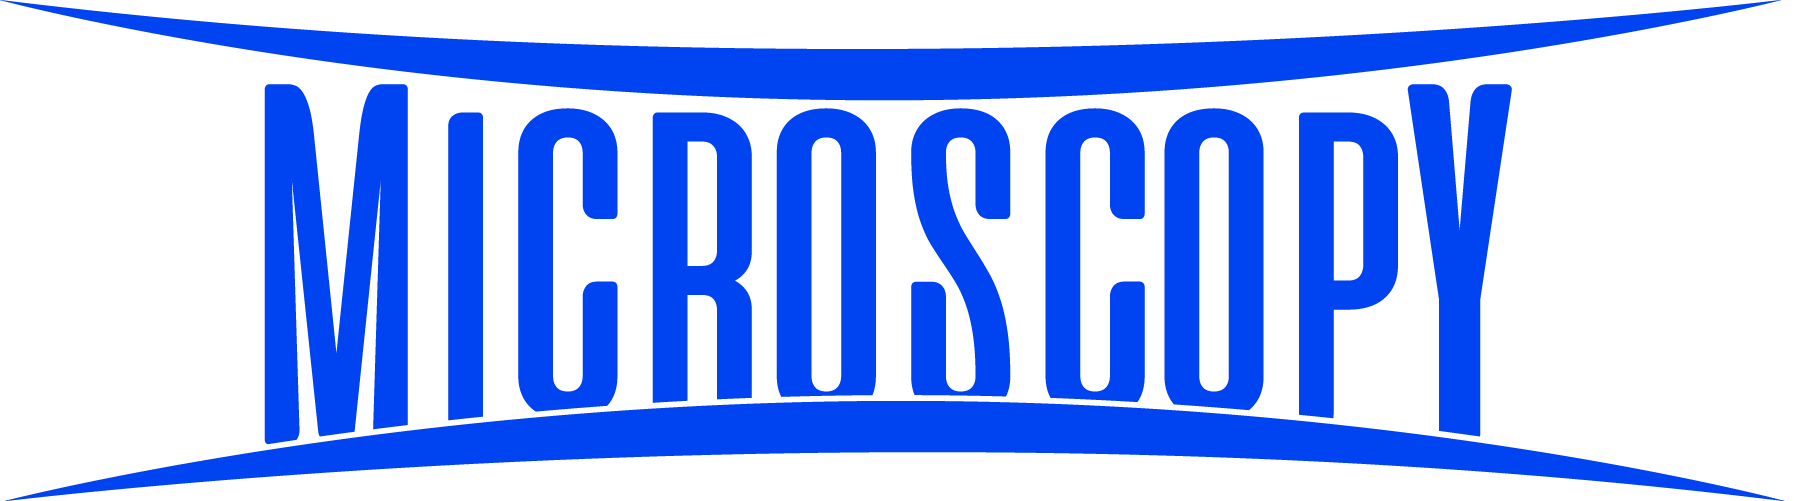 logo microscopy